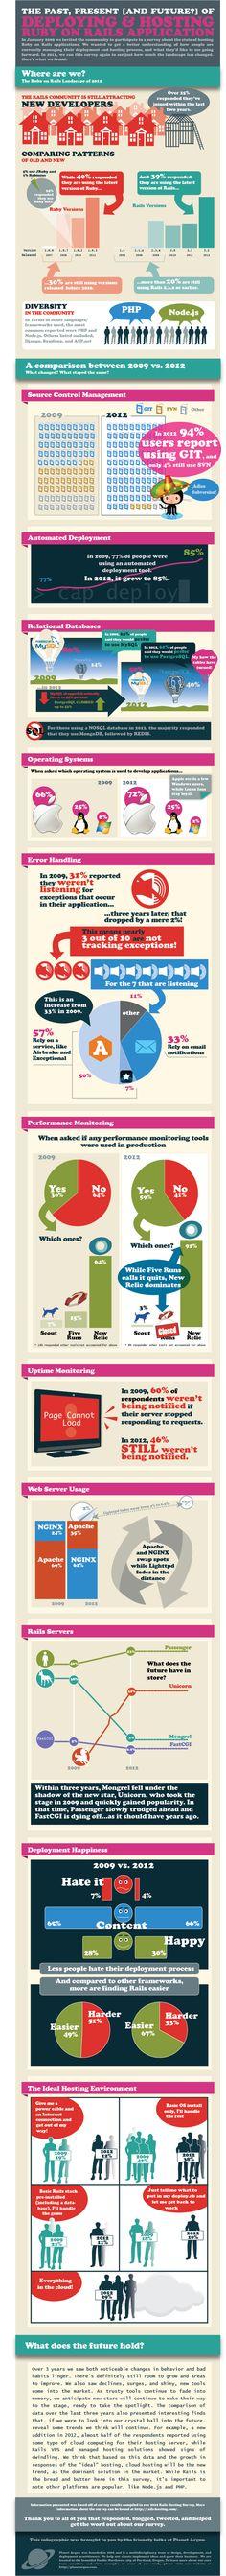 Rails survey results, very informative!